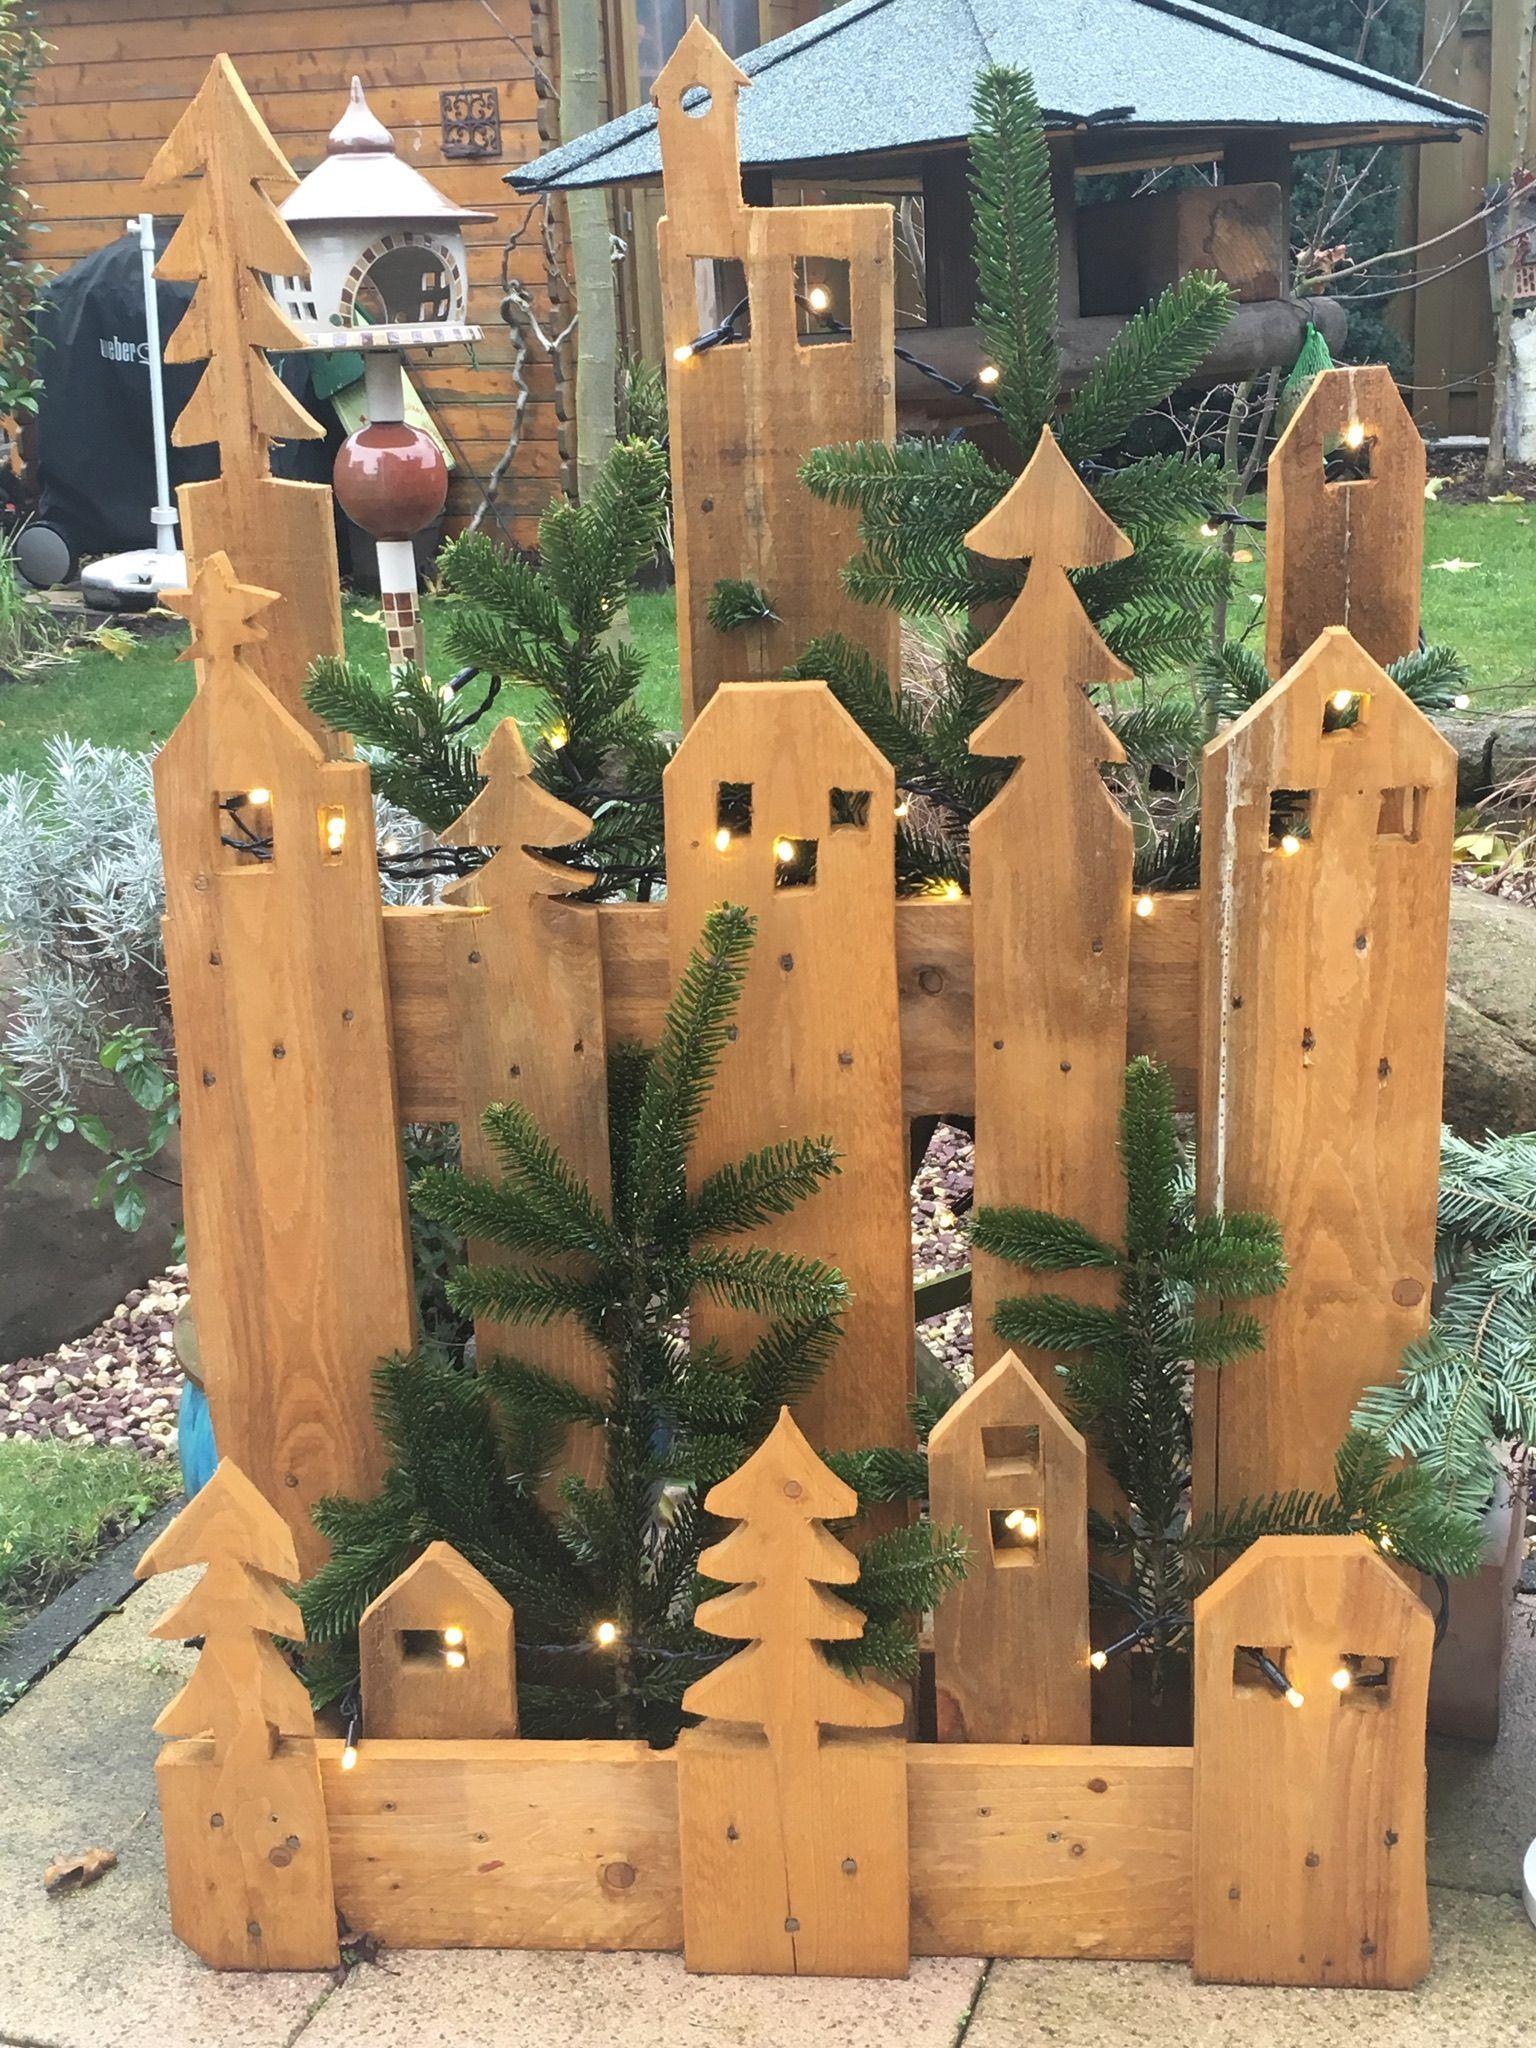 Europalette Christmas Decorations Paletten Deko Garten Dekoration Diy Garten Dekorat Wood Christmas Trees Diy Pallet Wood Christmas Pallet Wood Christmas Tree